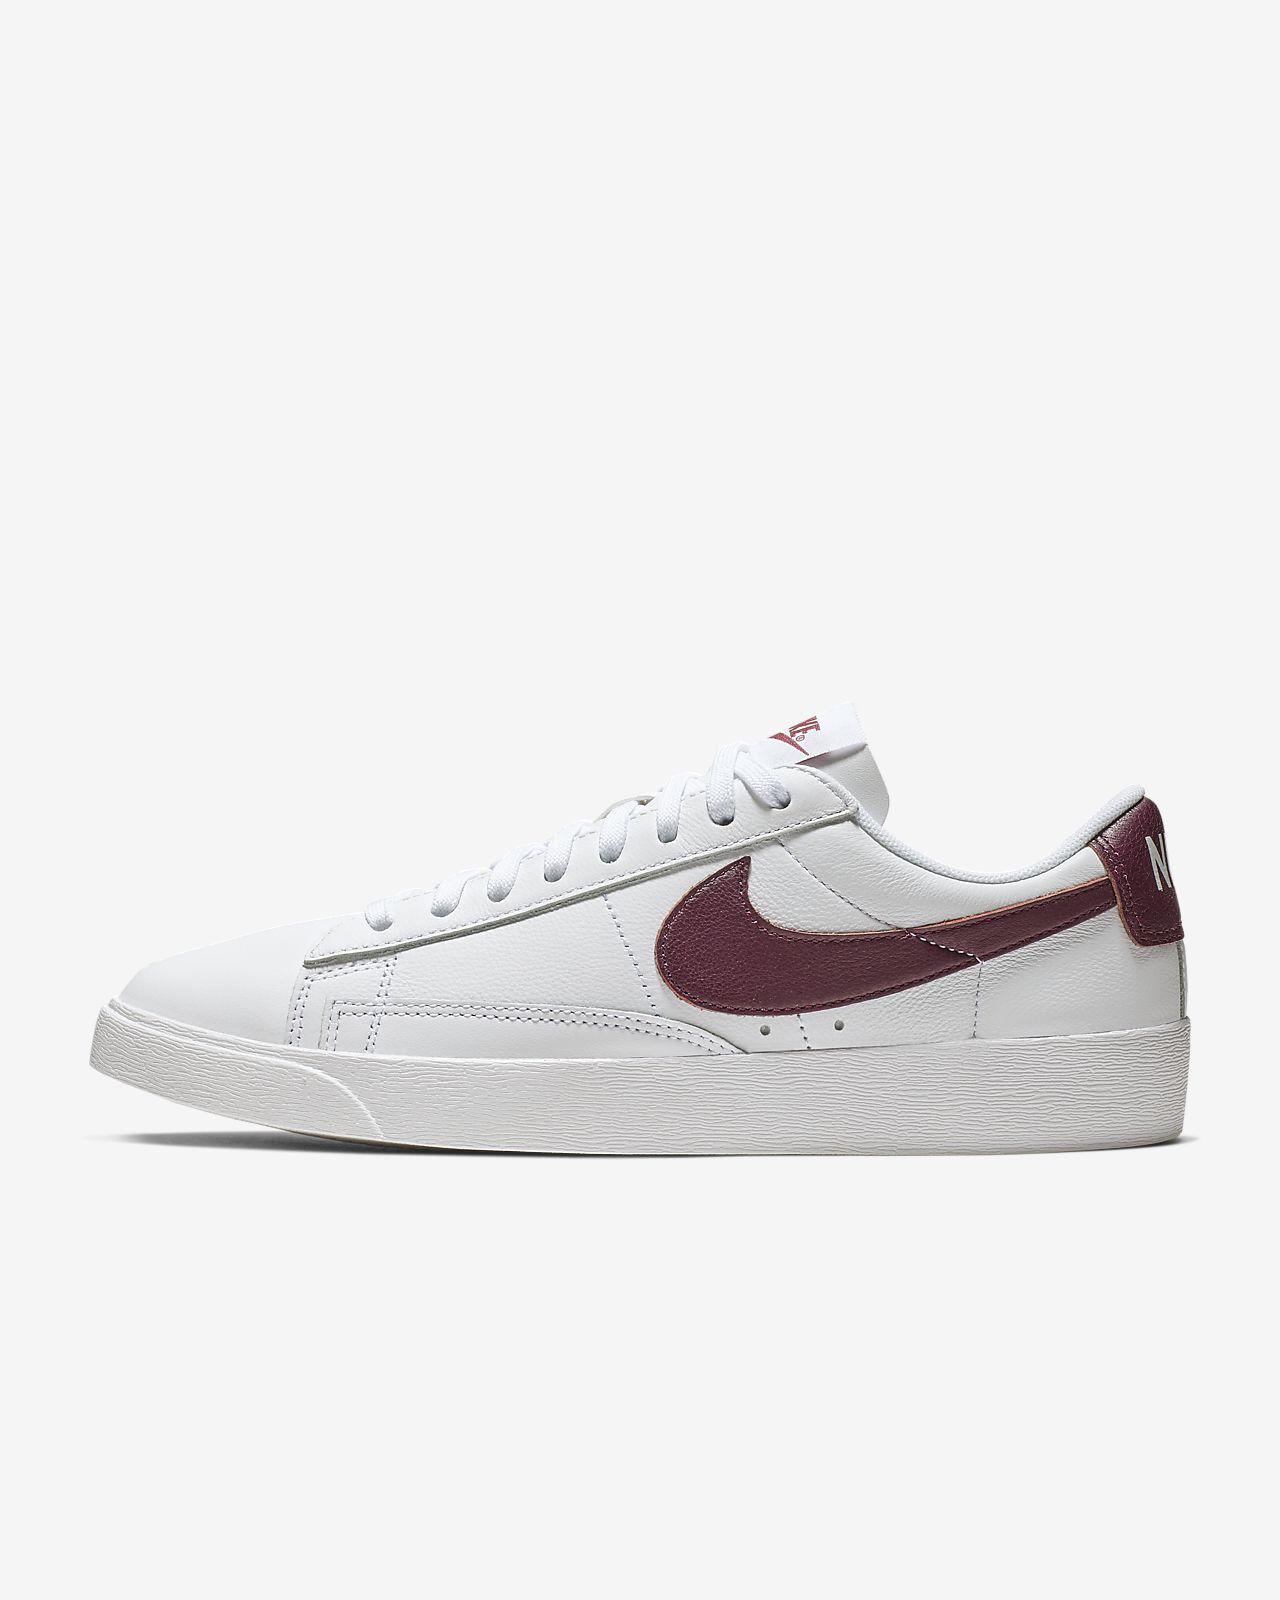 8afe8e5c440 Nike Blazer Low LE Women s Shoe. Nike.com BE